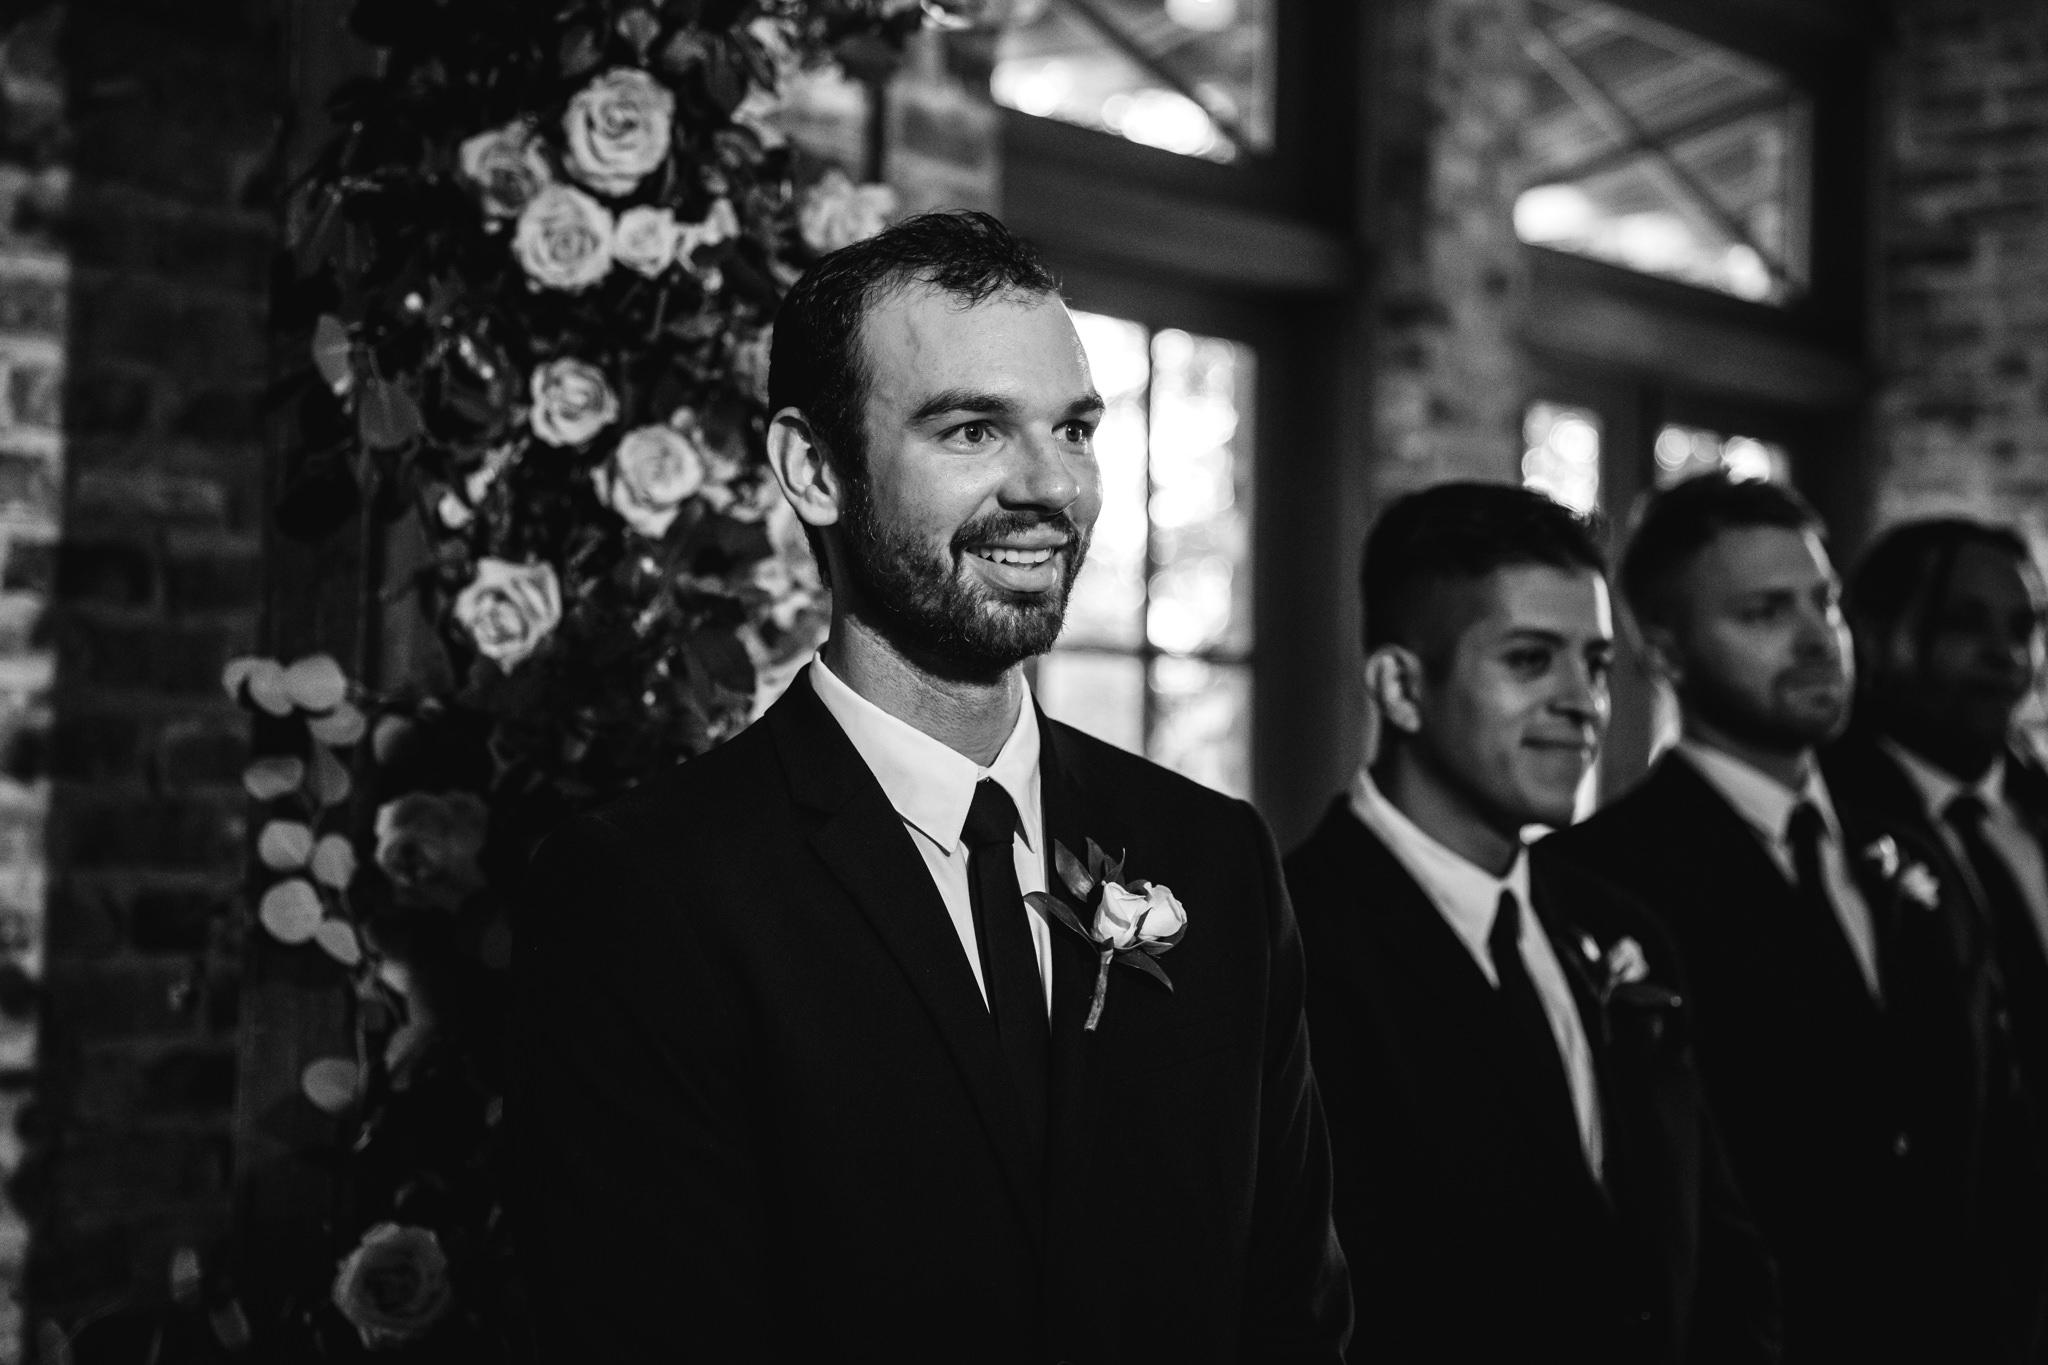 phantom-canyon-brewery-colorado-springs-wedding-photographer-389.jpg